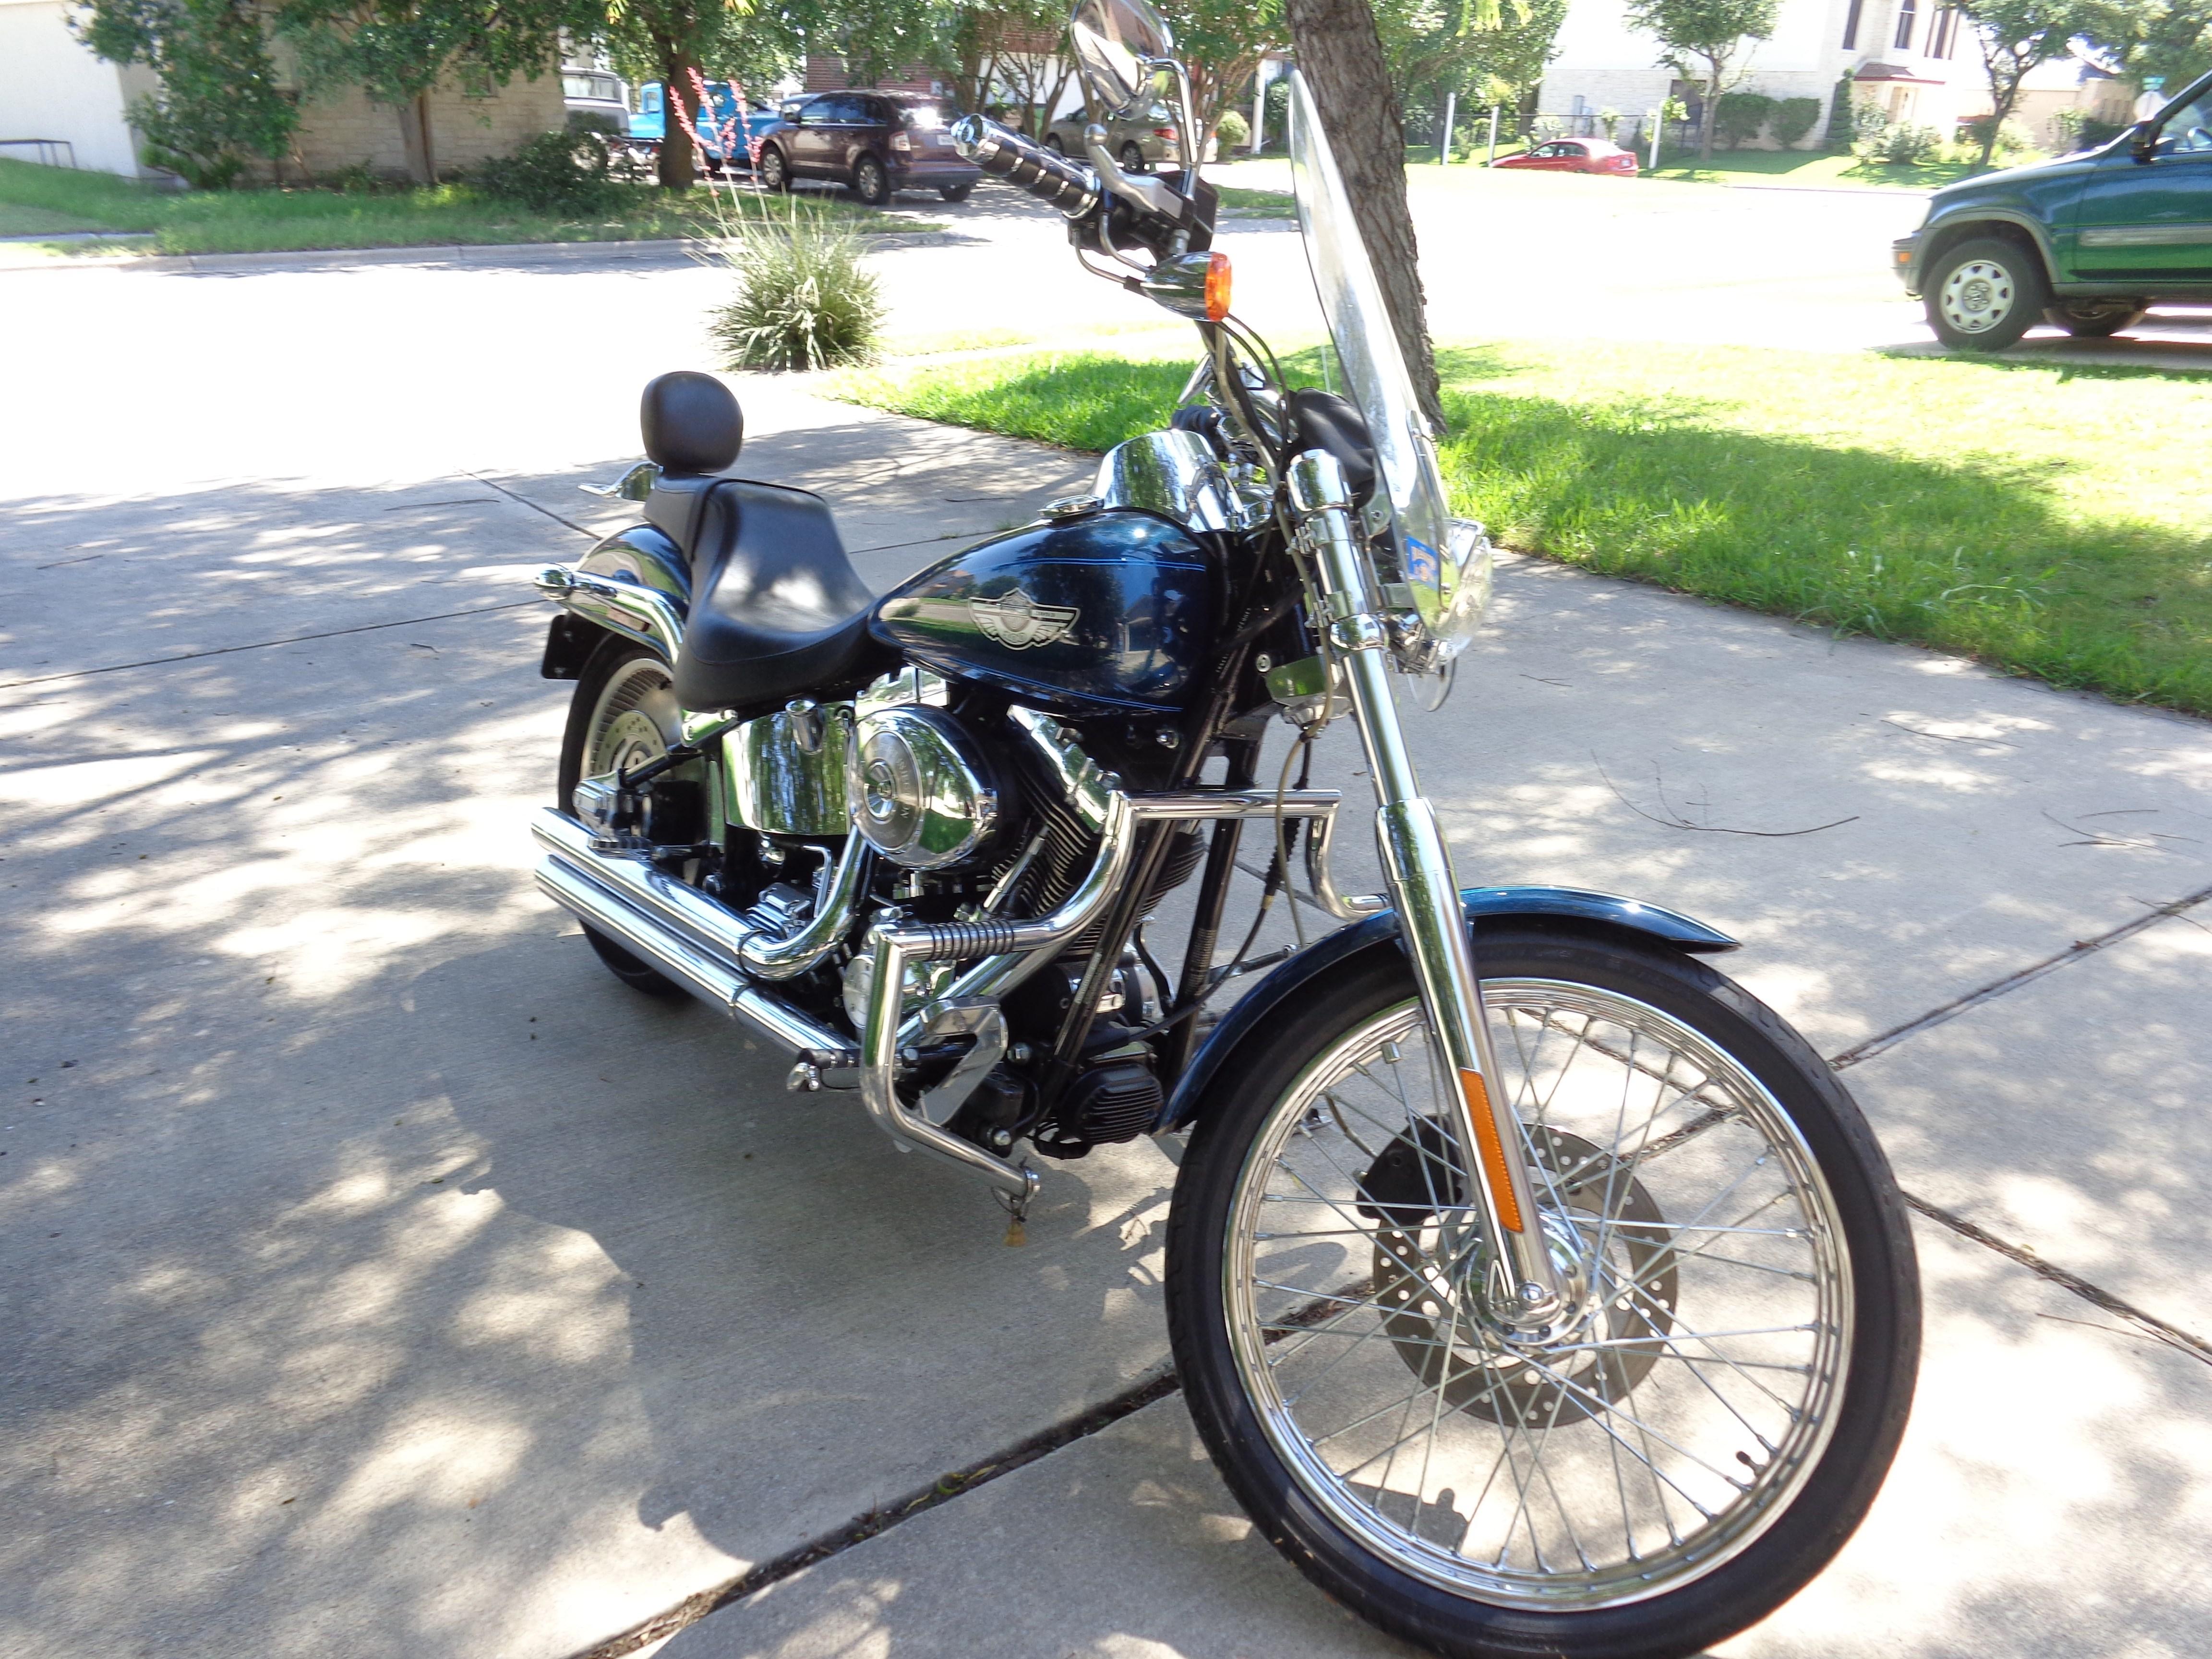 Used Harley Davidson Motorcycles For Sale San Marcos Tx >> 2003 Harley-Davidson® FXSTD/I Softail® Deuce™ (Luxury Blue), Round Rock, Texas (656652 ...